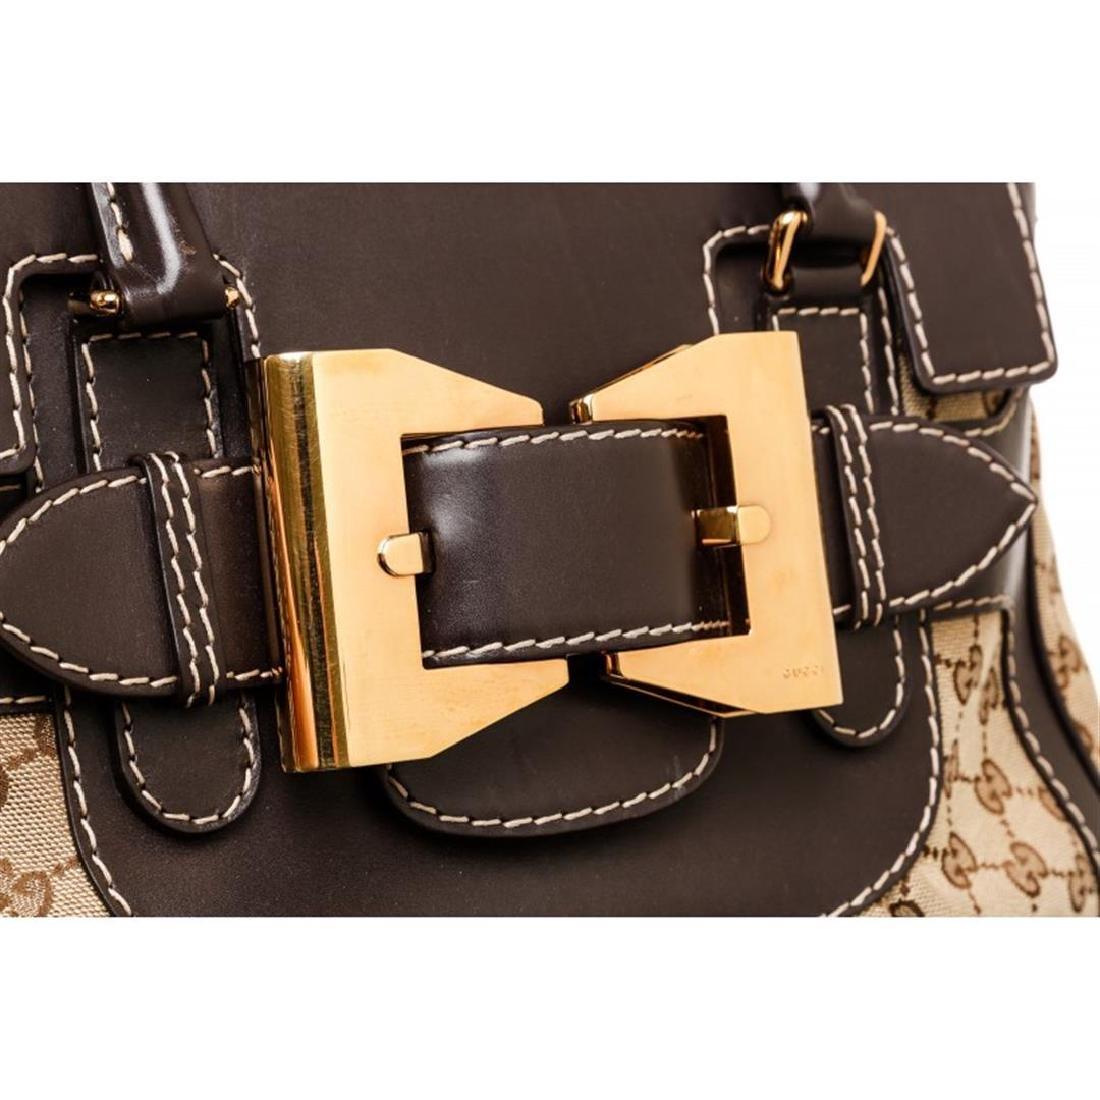 Gucci Beige Canvas Monogram Brown Leather Dialux Queen - 8